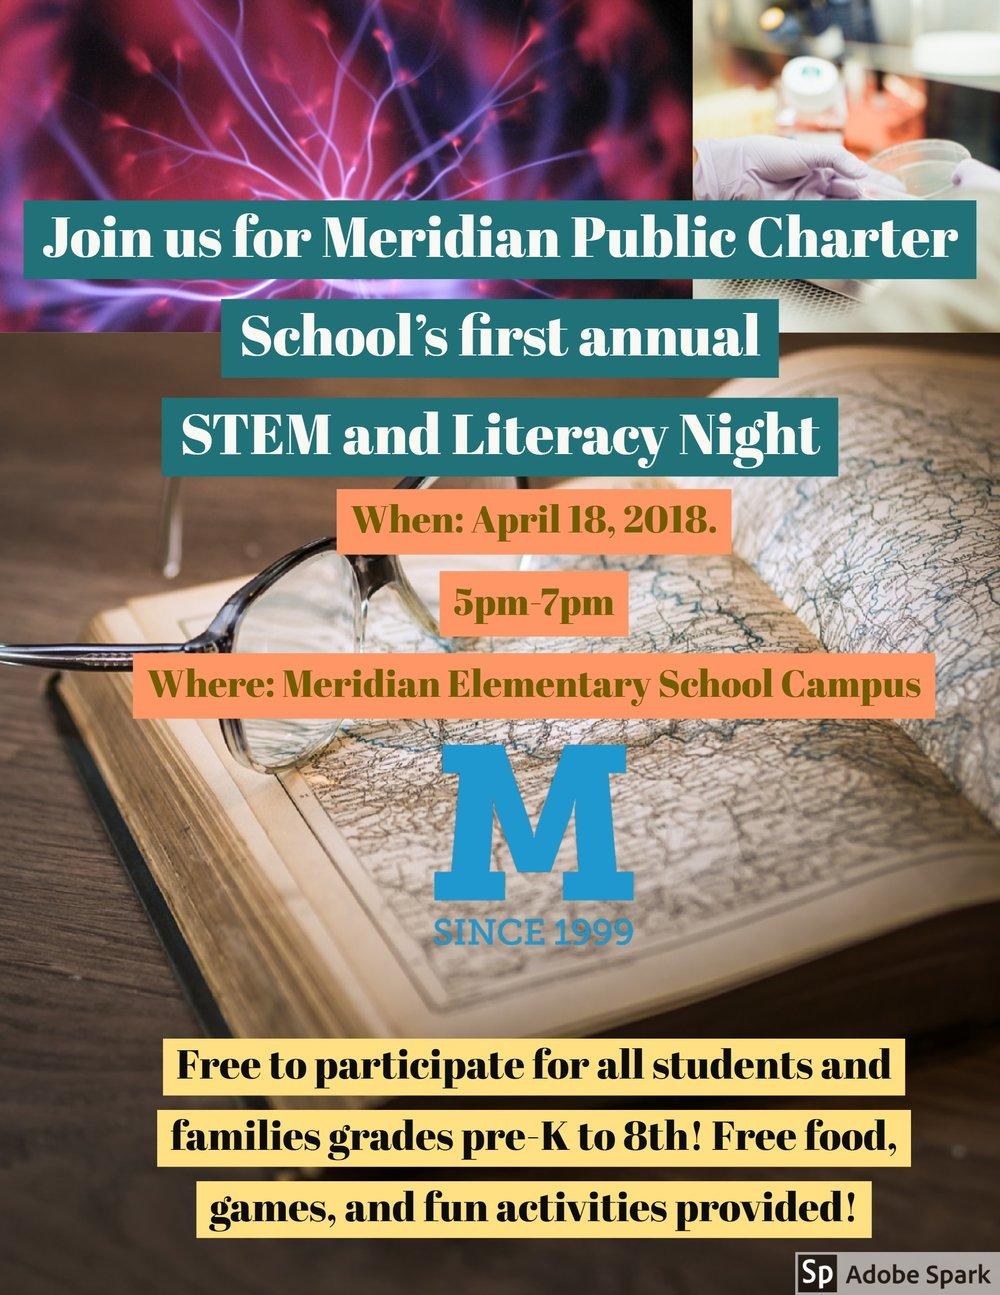 STEM and Literacy night flyer.jpg